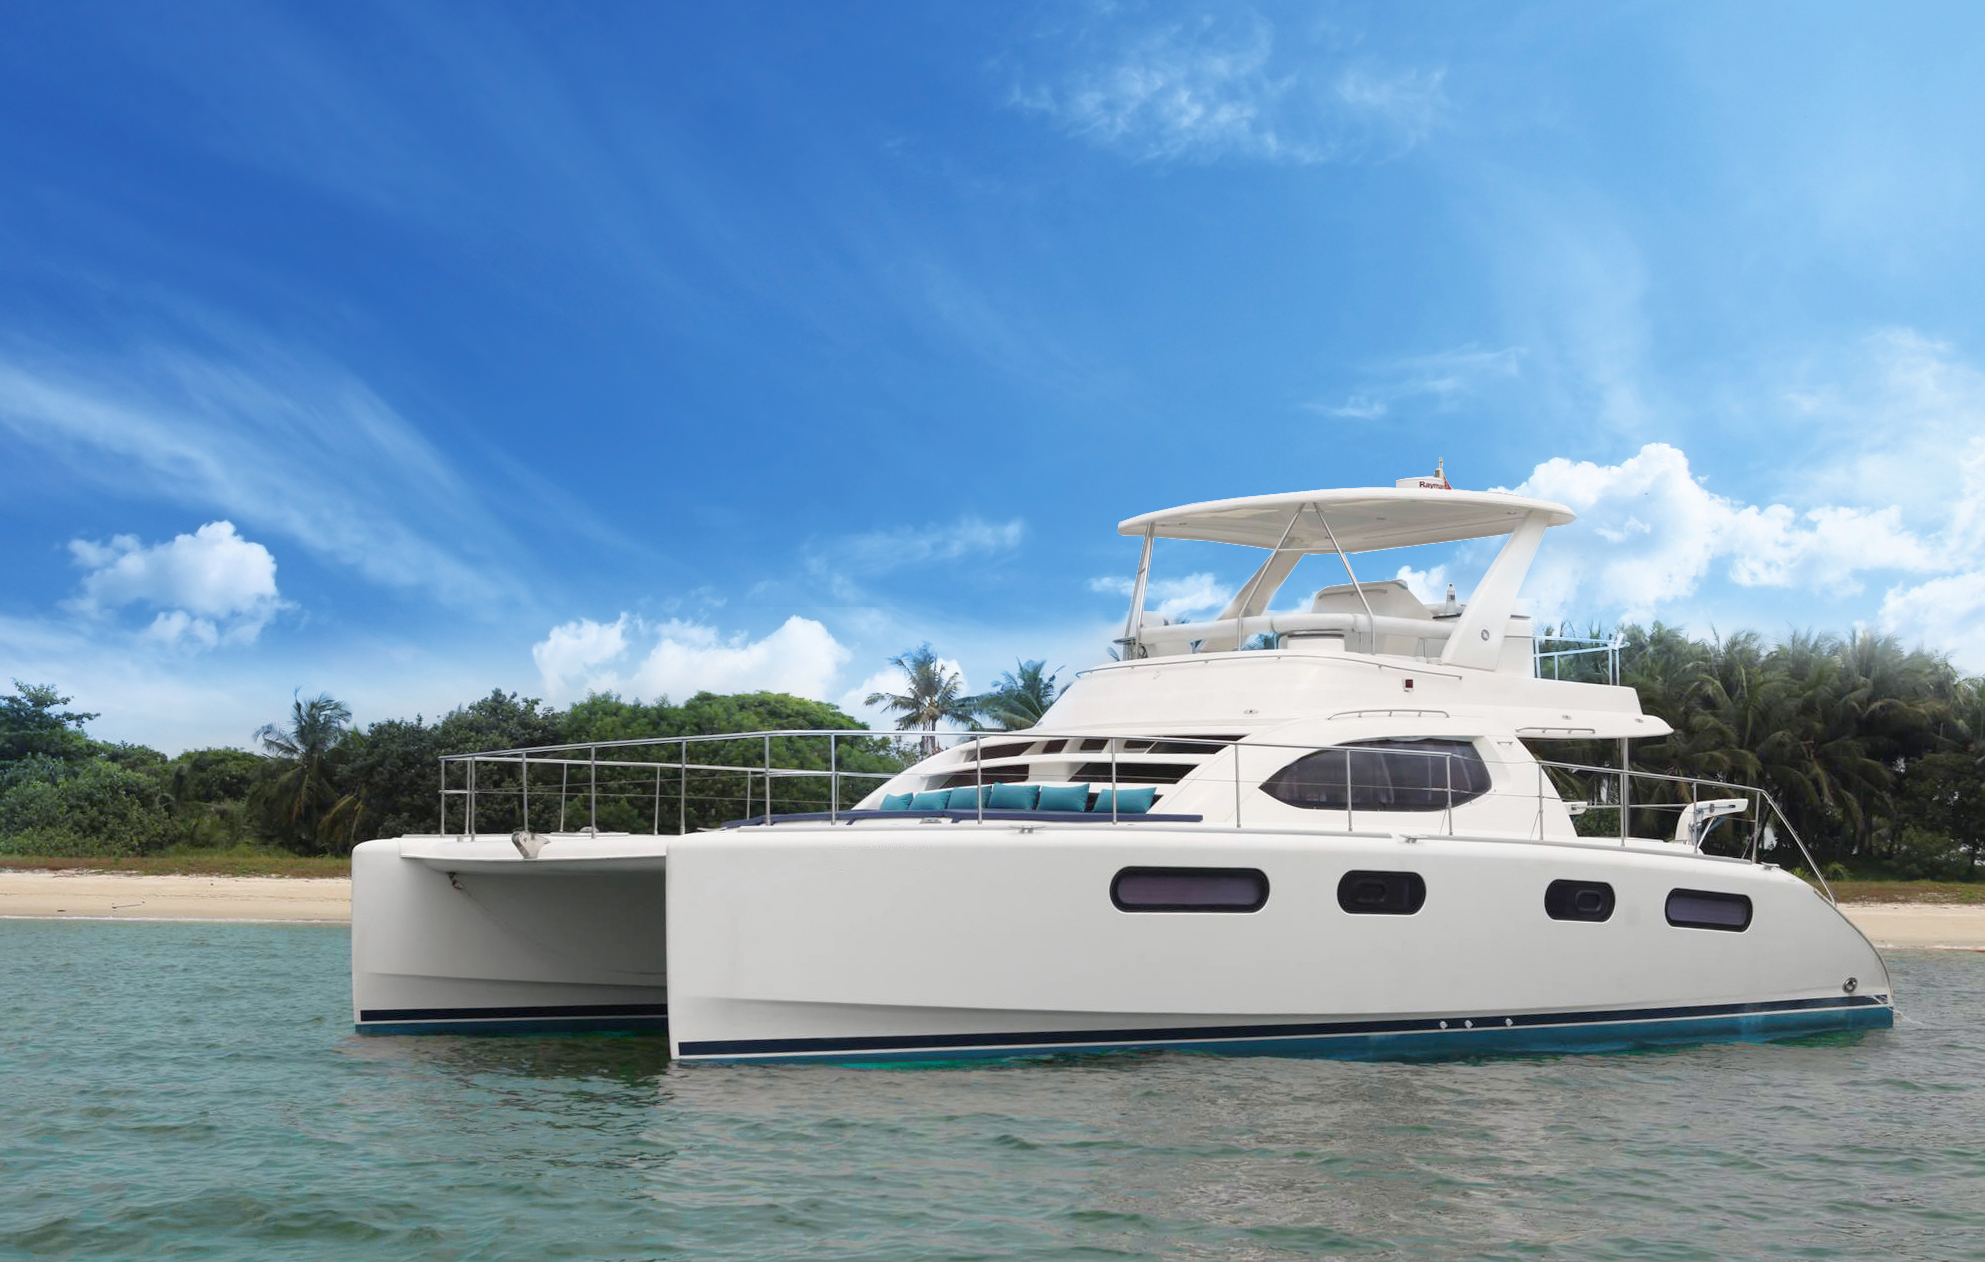 Unique-wedding-location-venuerific-blog-mikanna-luxury-yacht